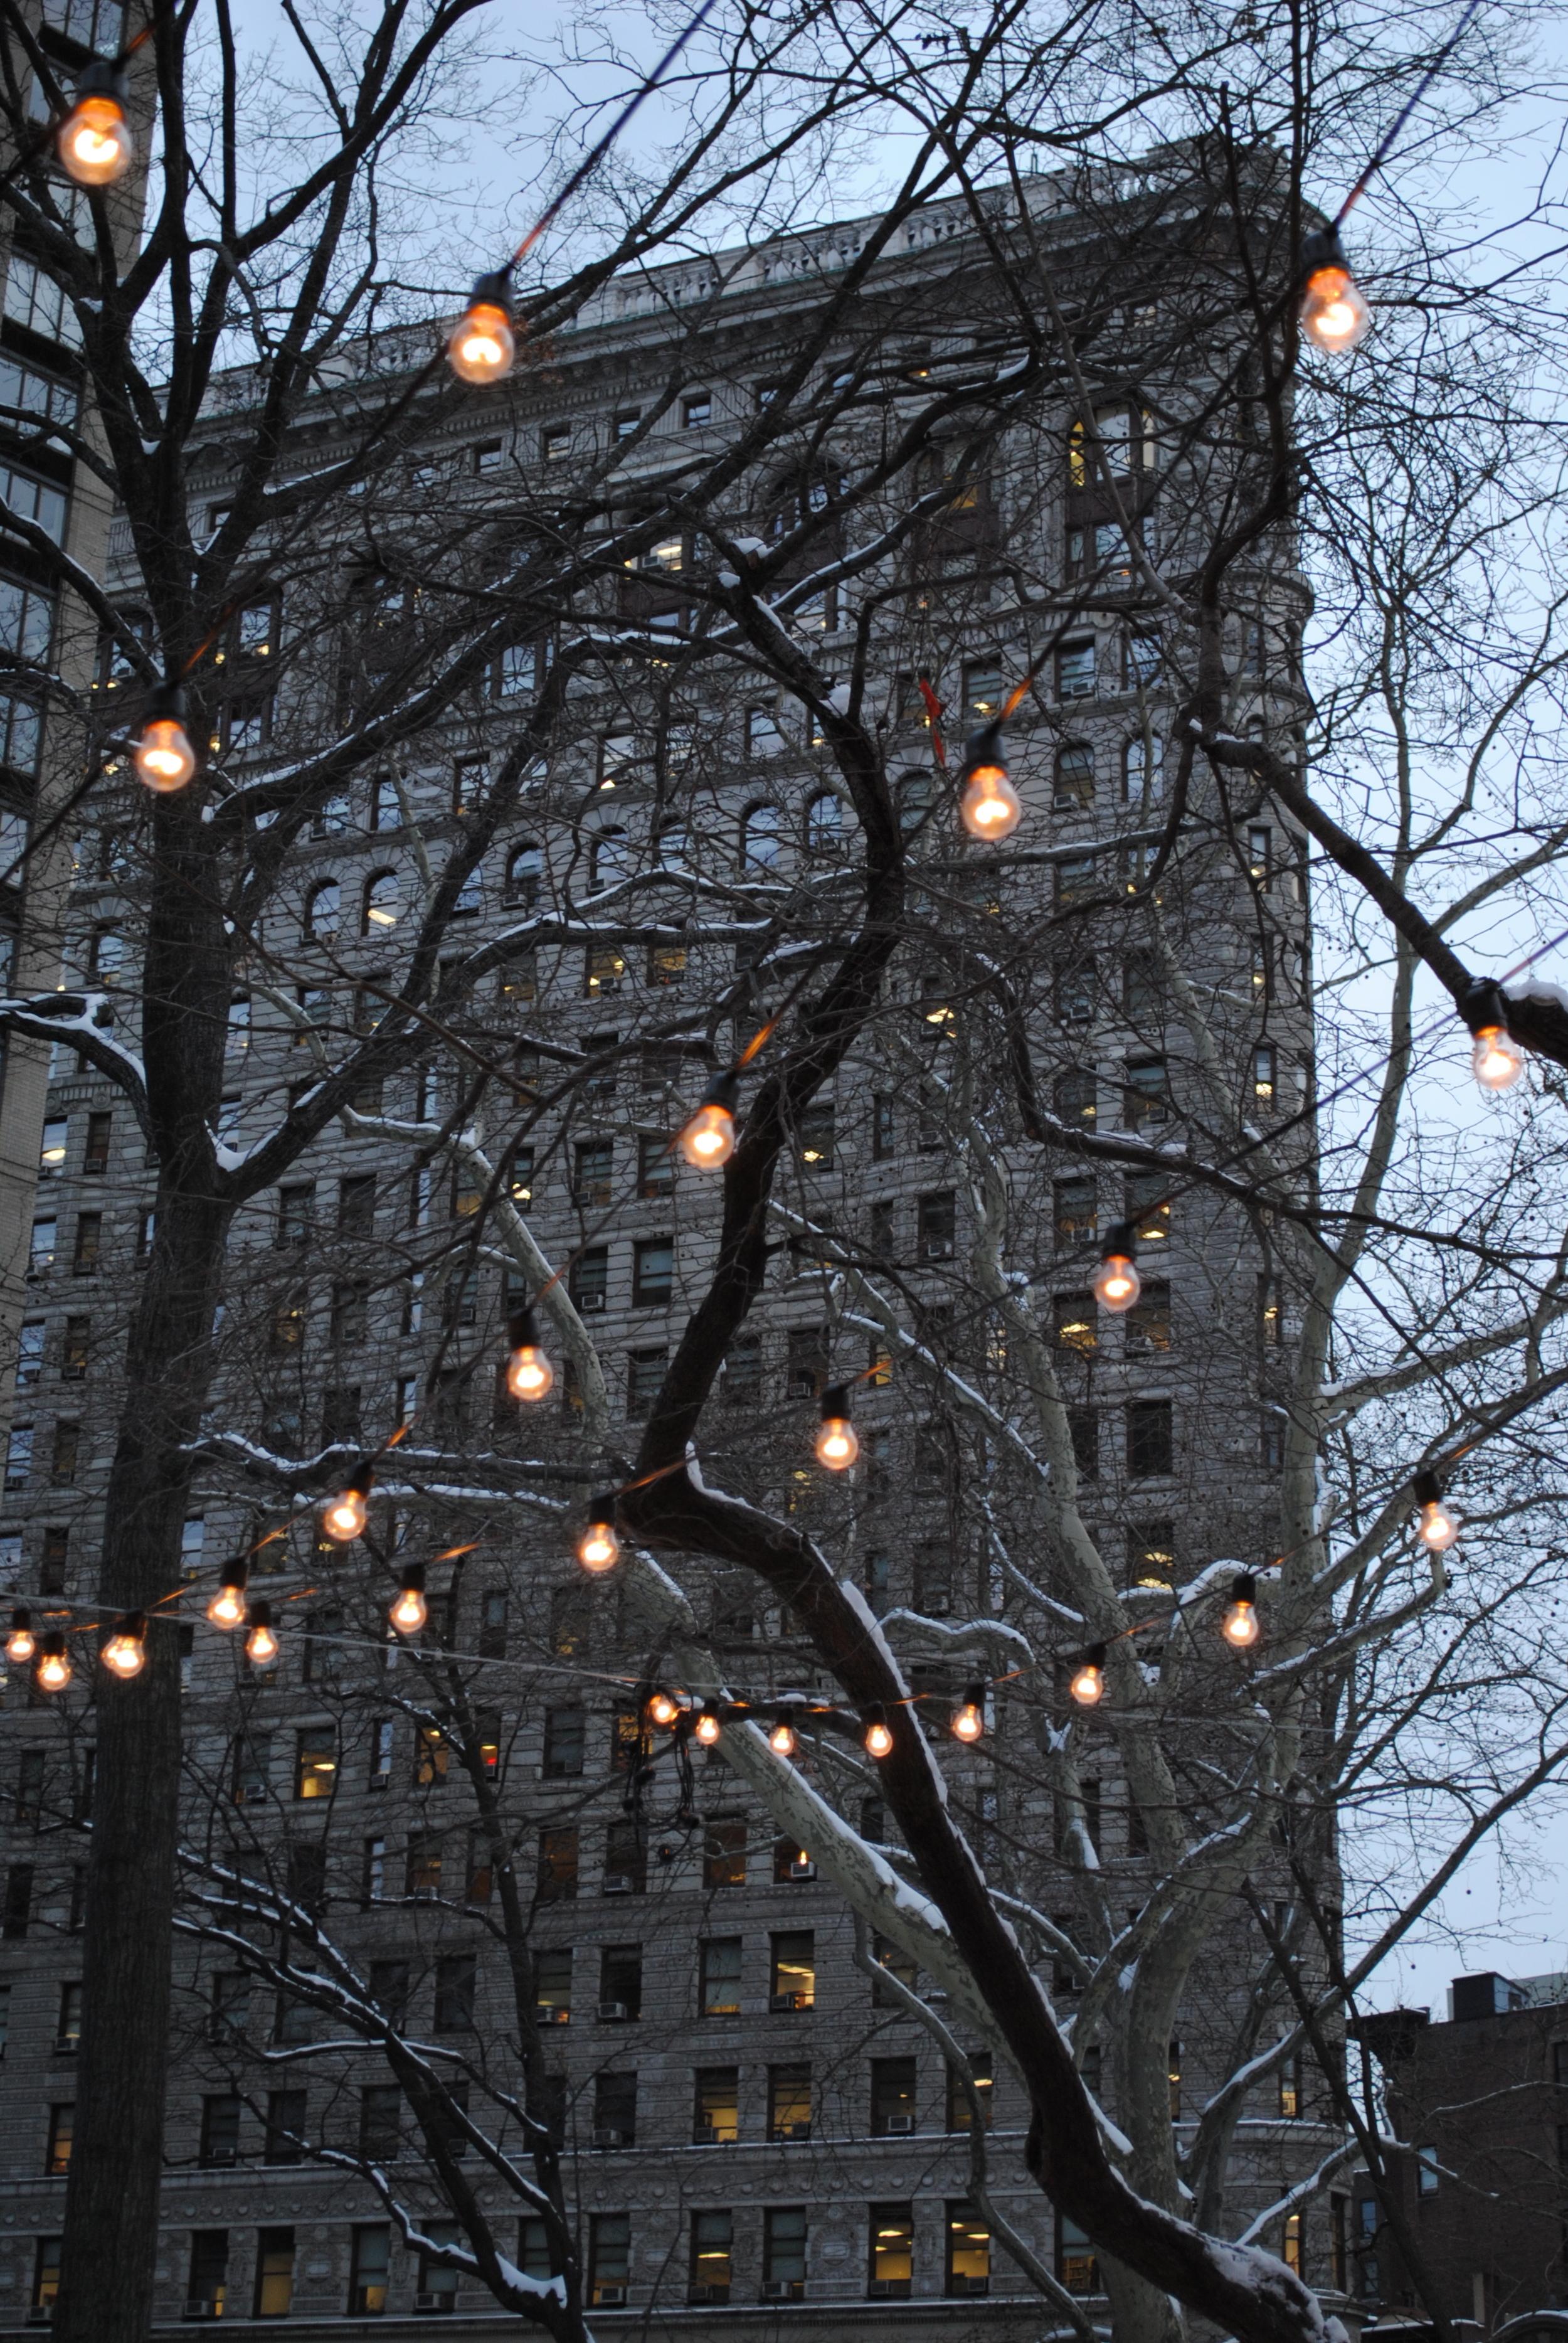 Fairylight-Twilight Flatiron , Madison Square Park NYC, December 2010